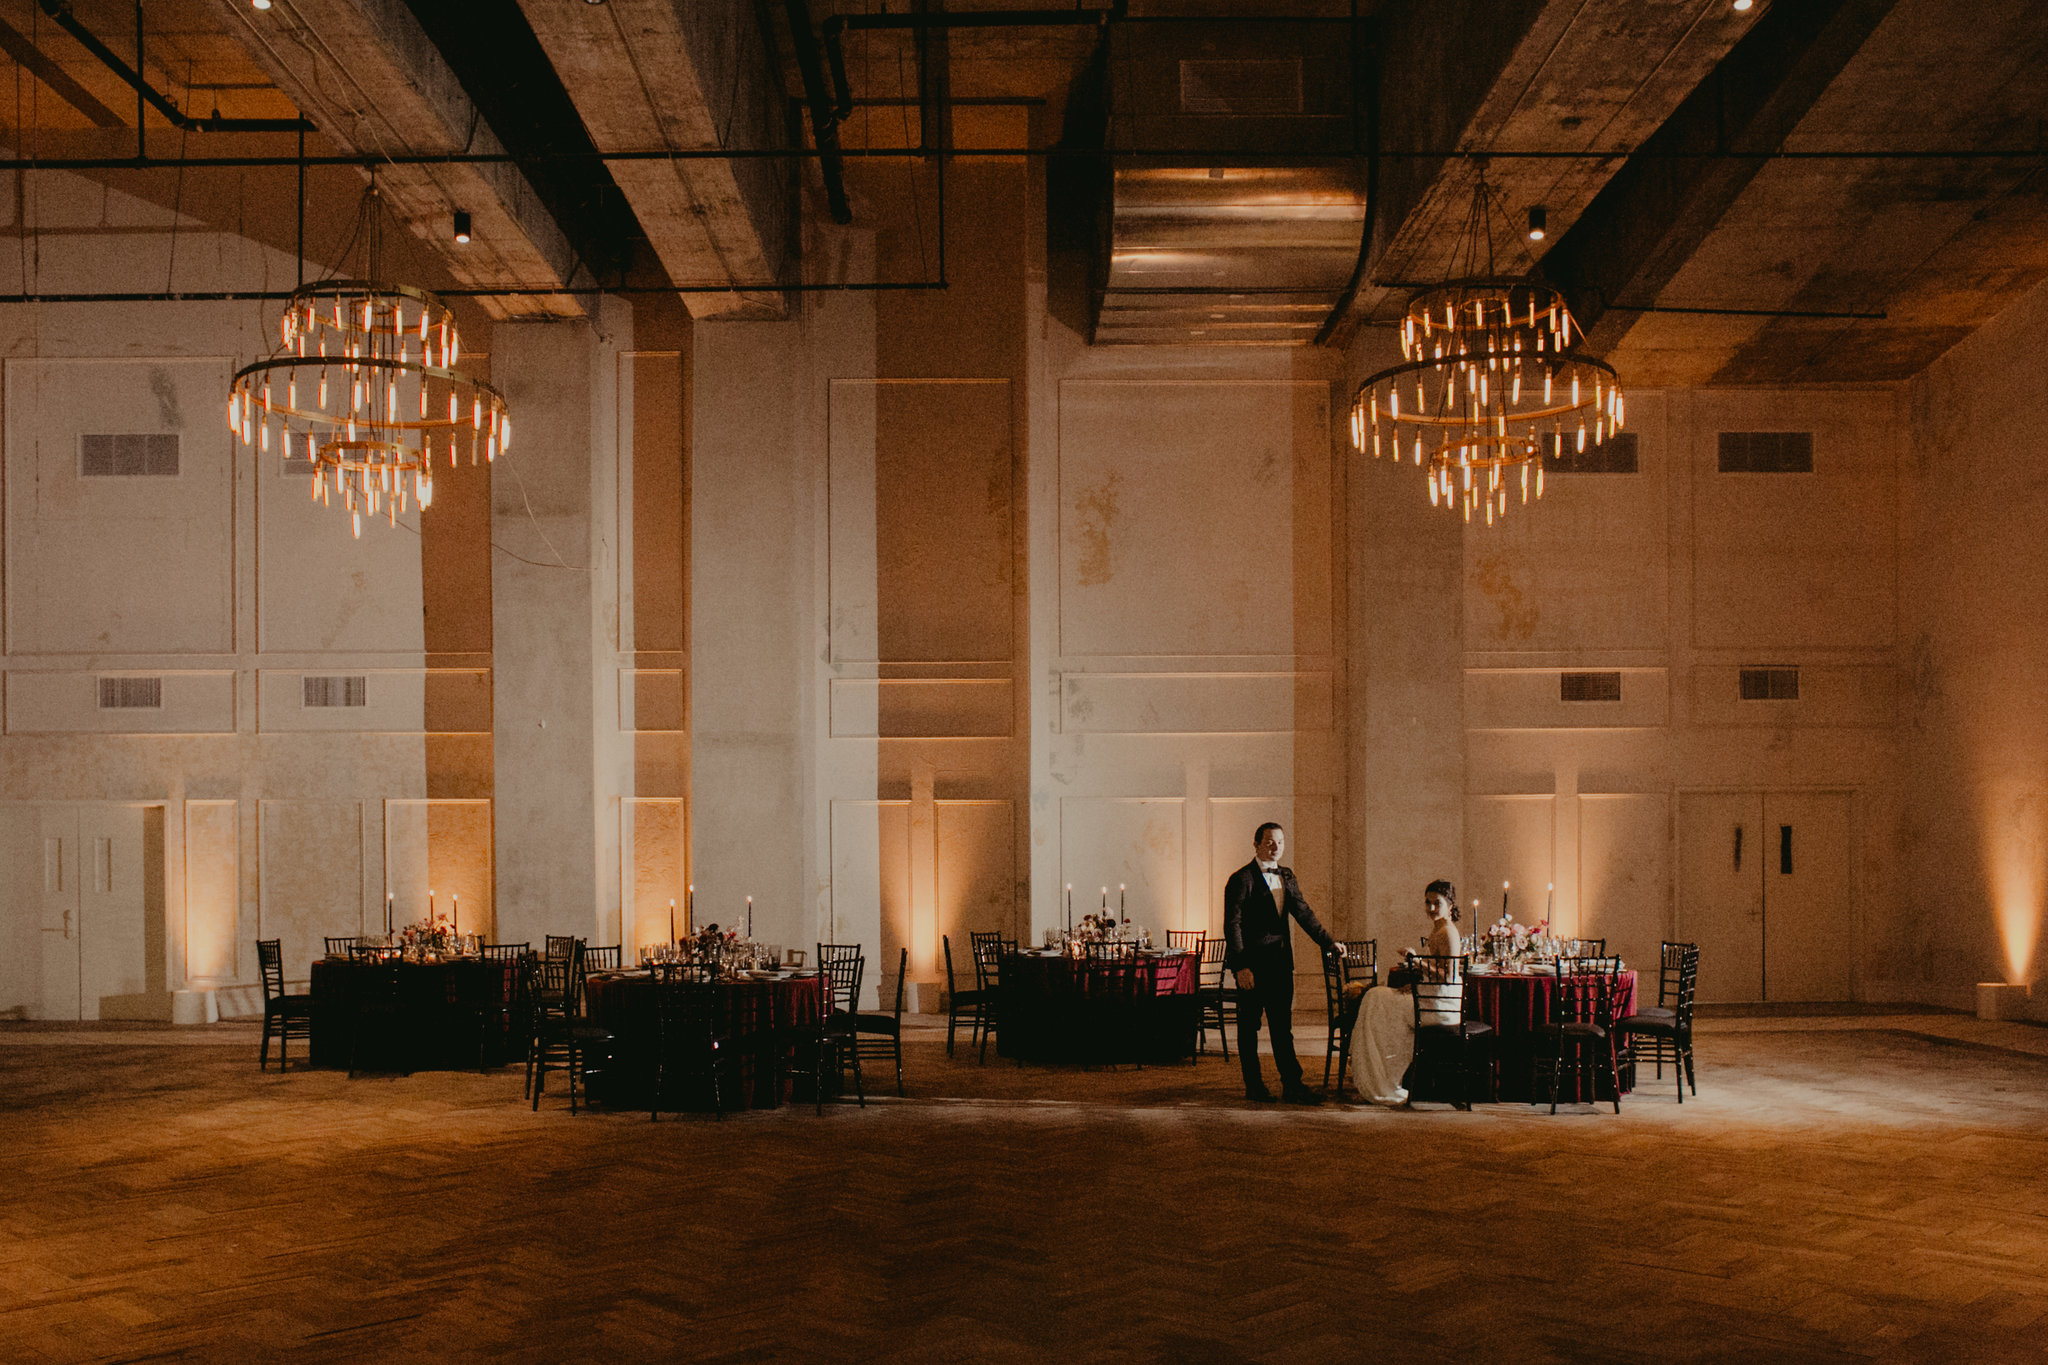 Williamsburg_Hotel_Wedding_Photographer_Chellise_Michael_Photography-234.jpg